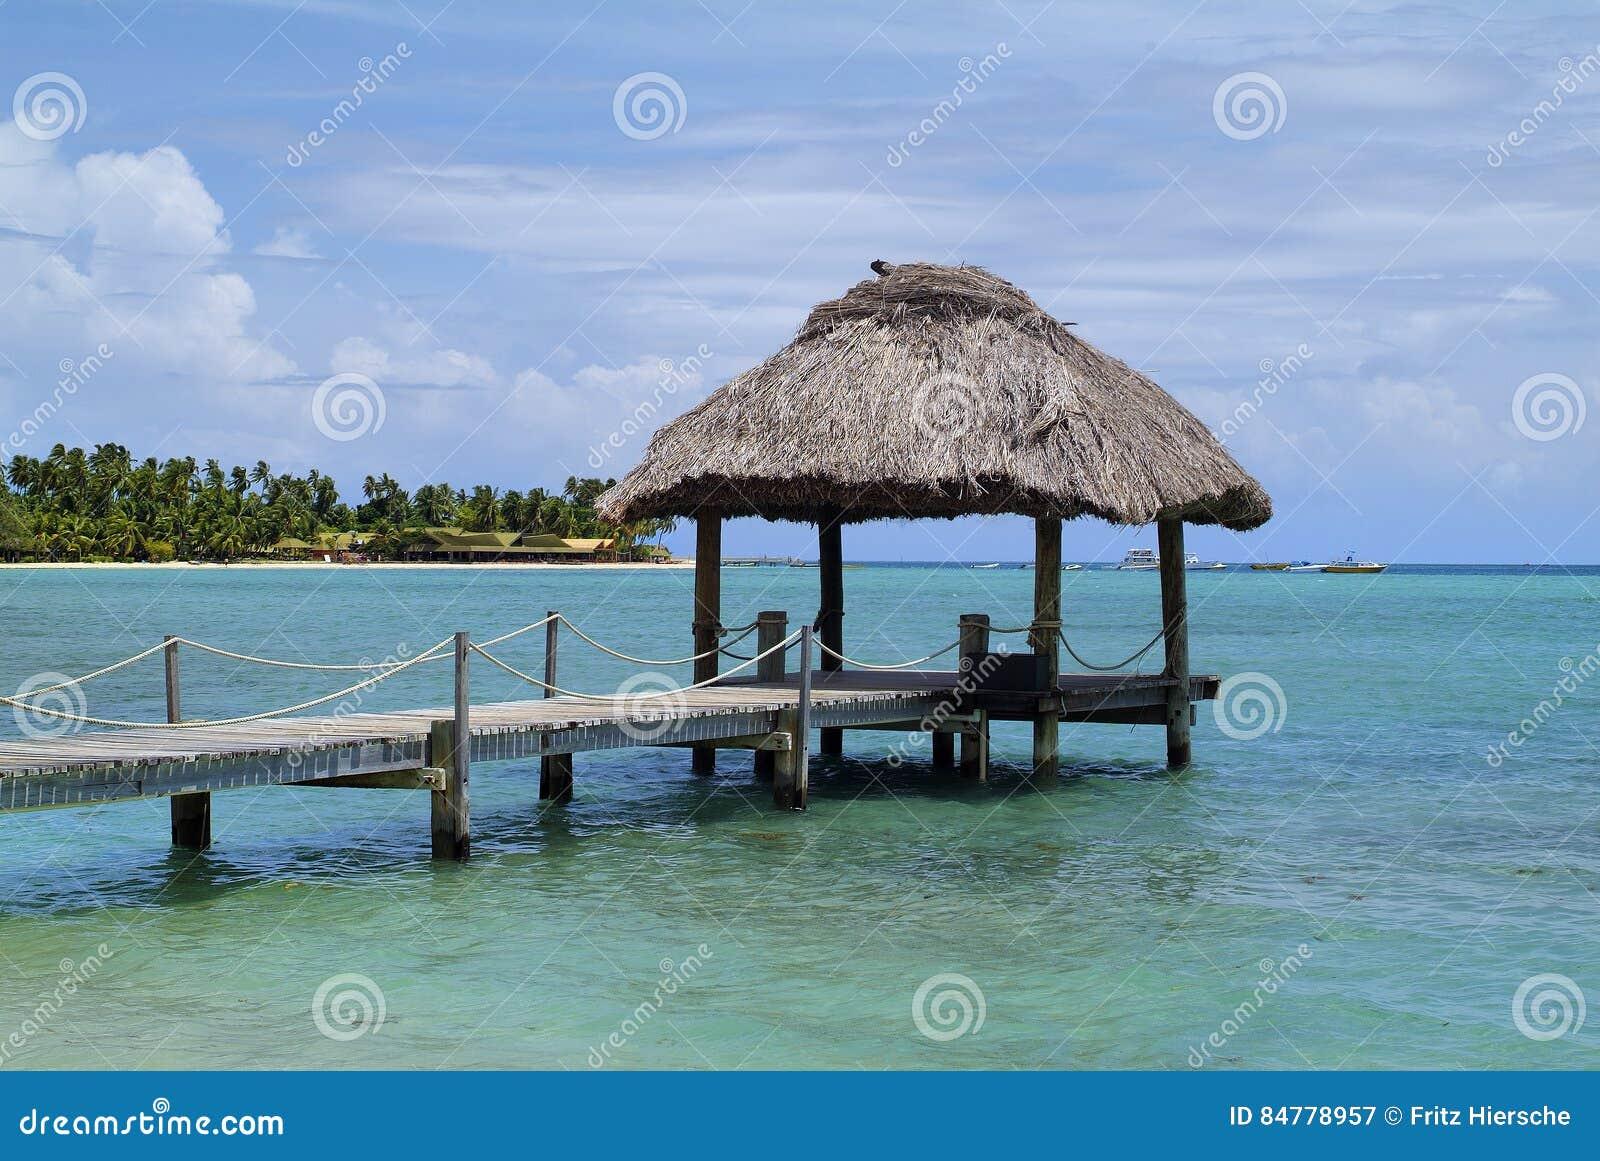 Fidschi-Insel